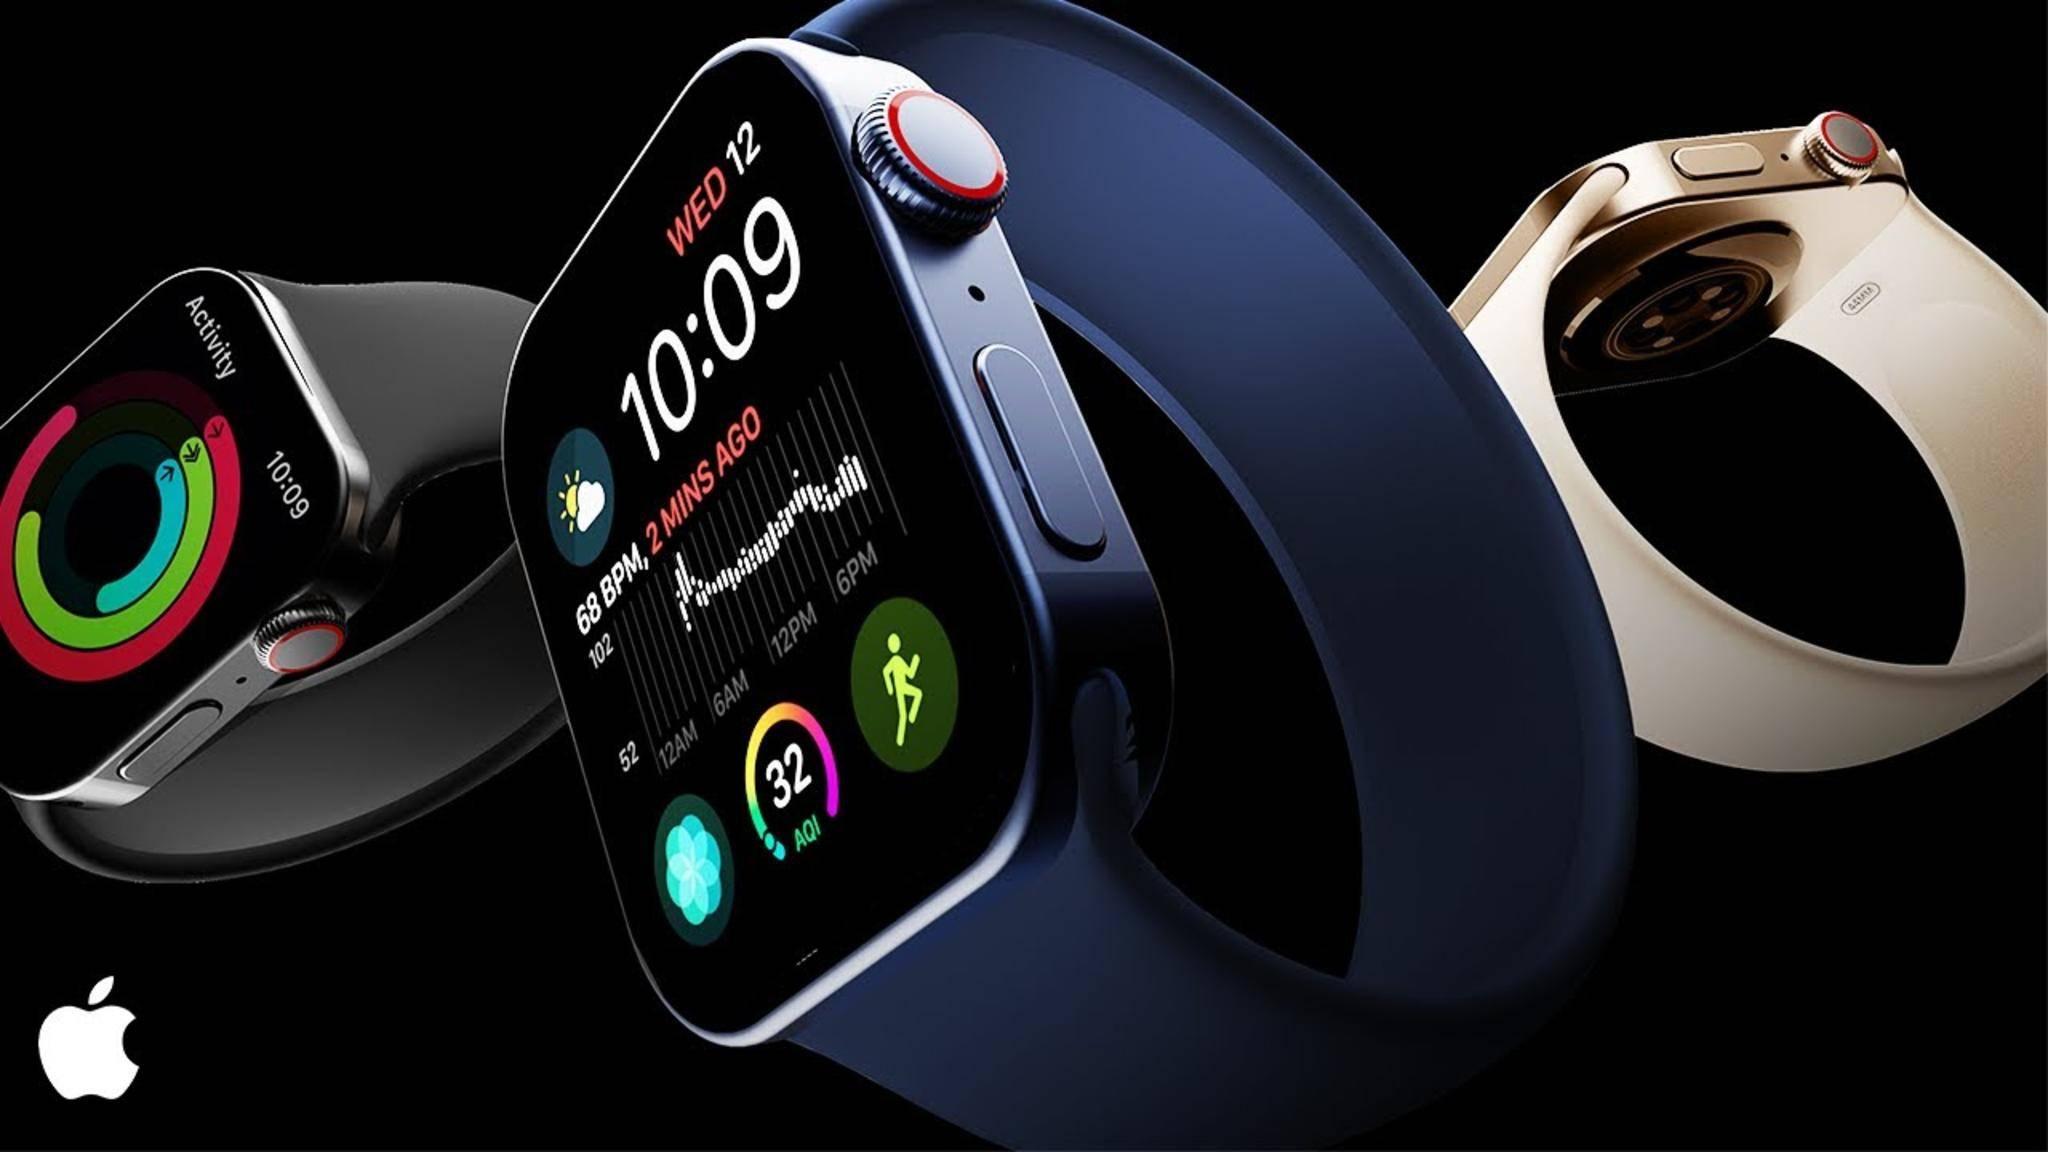 apple-watch-concept